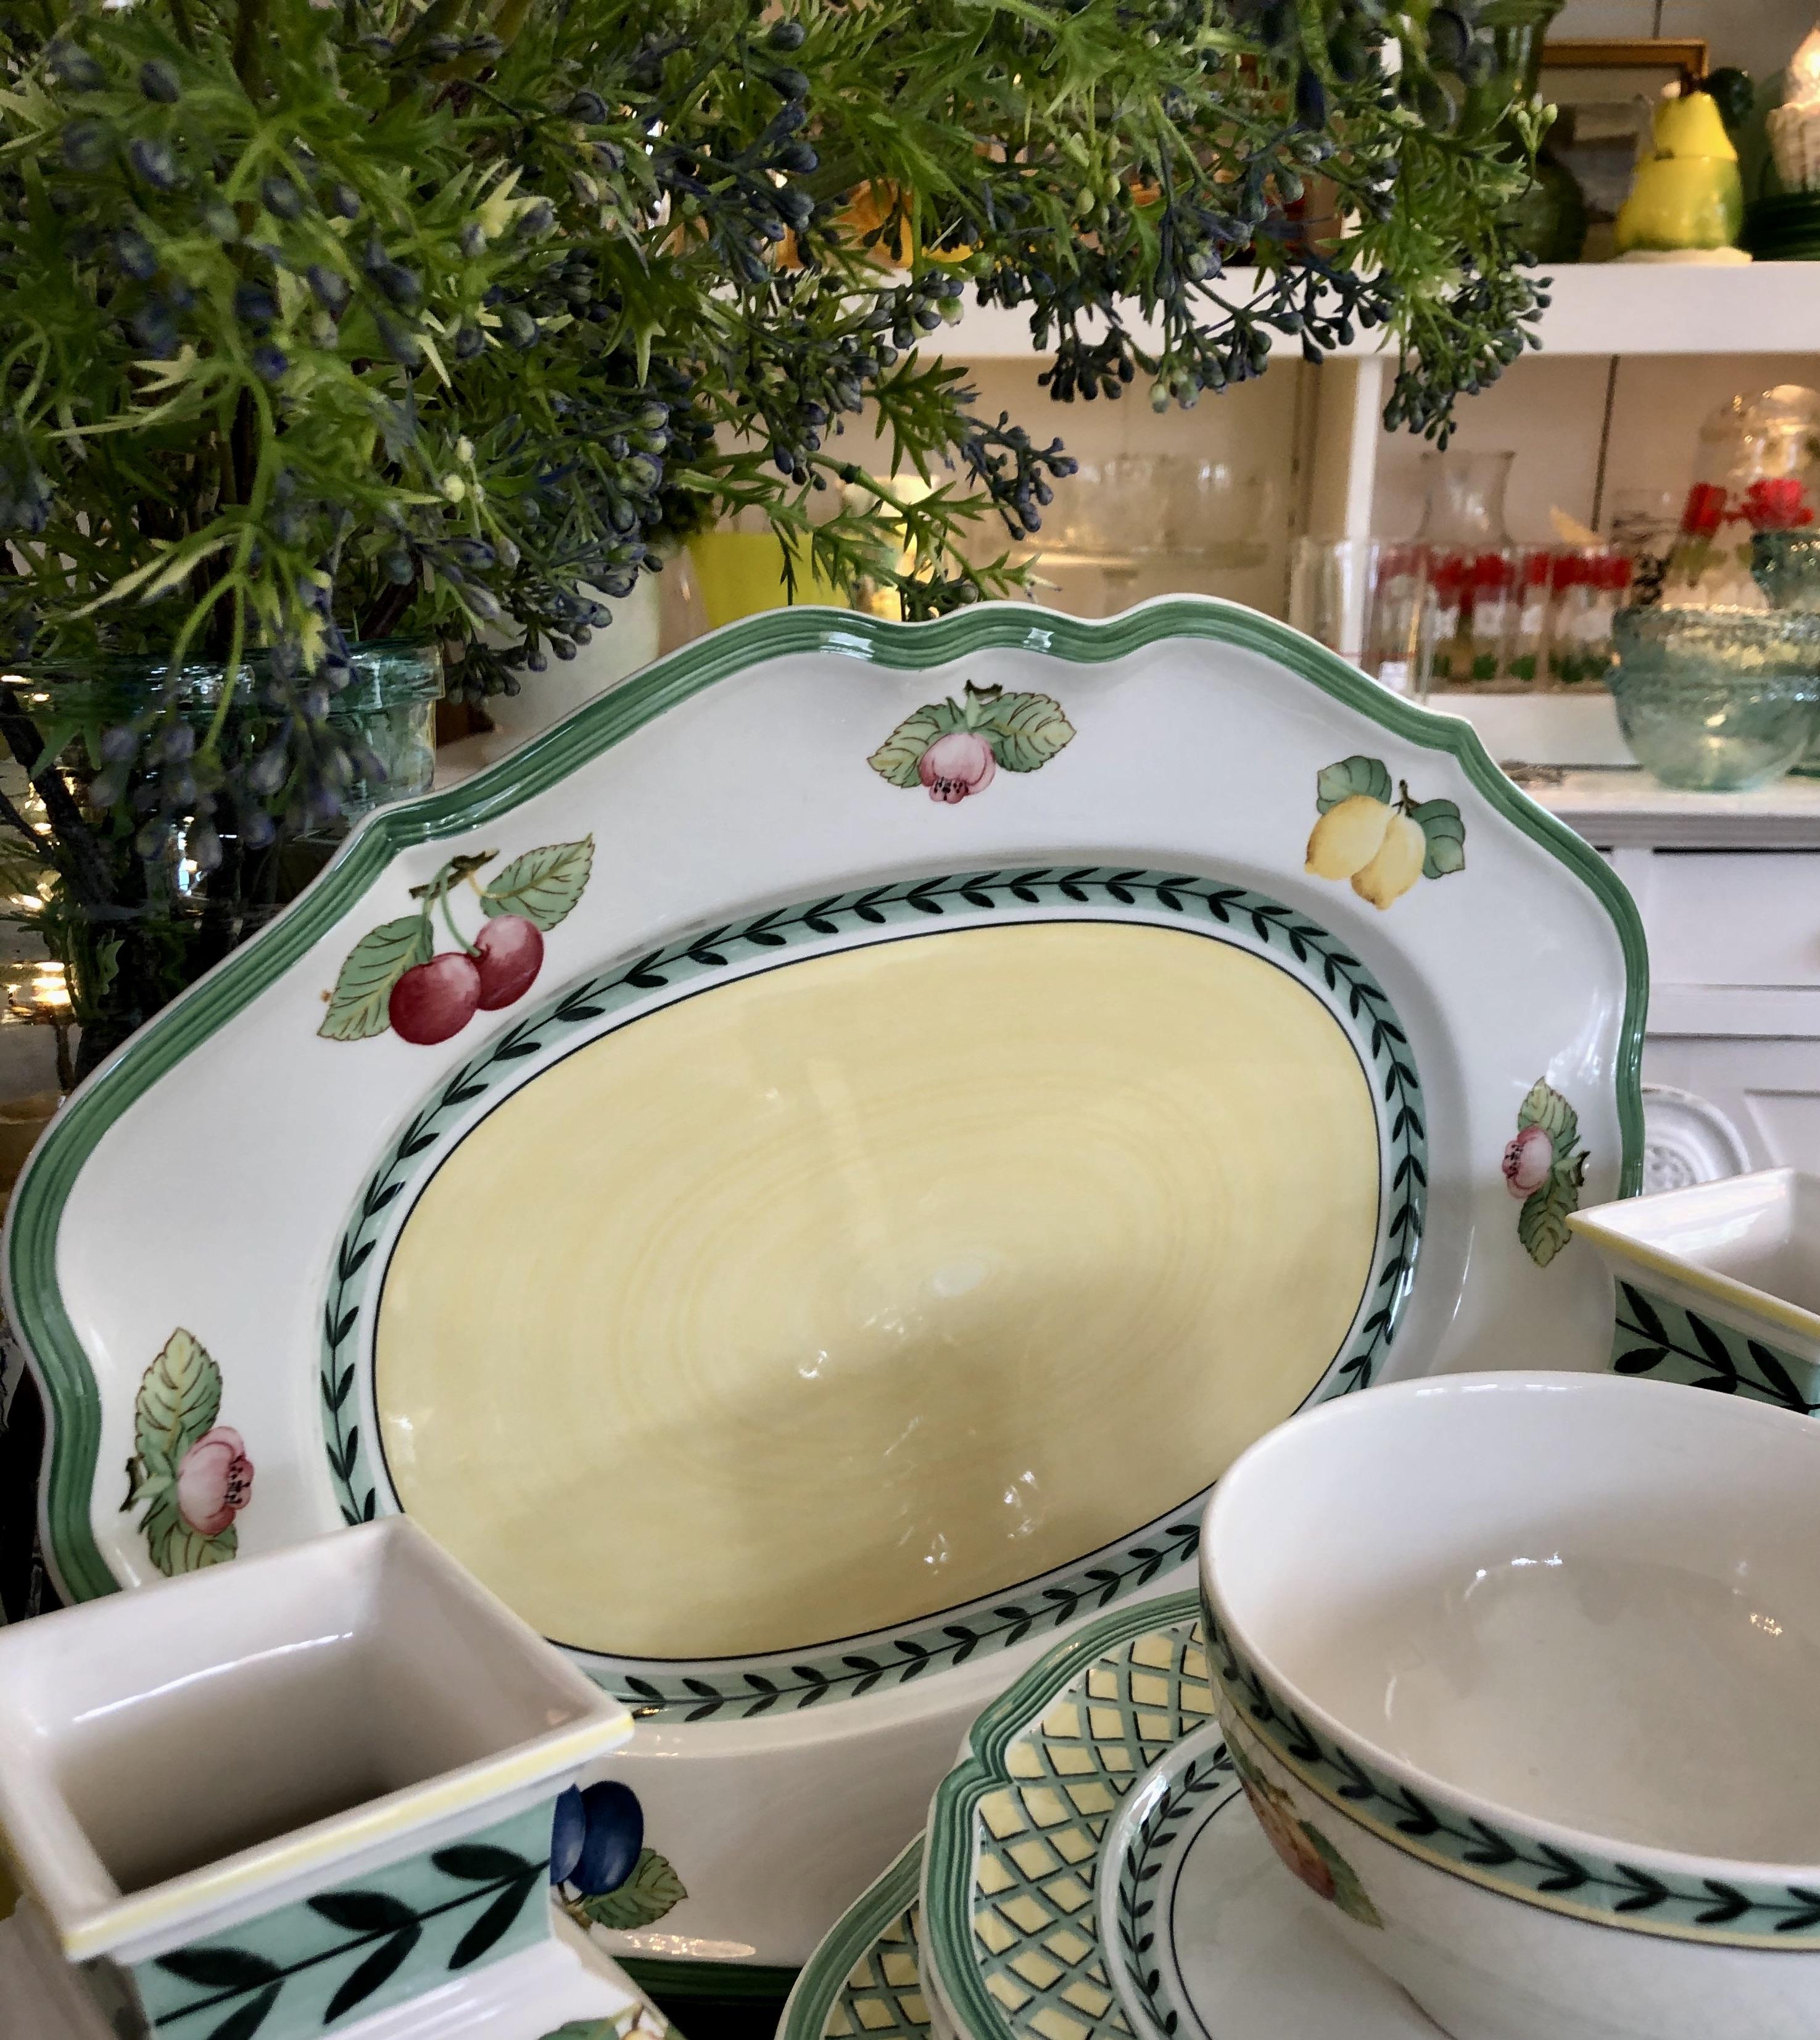 Villeroy and Boch Serving Platter